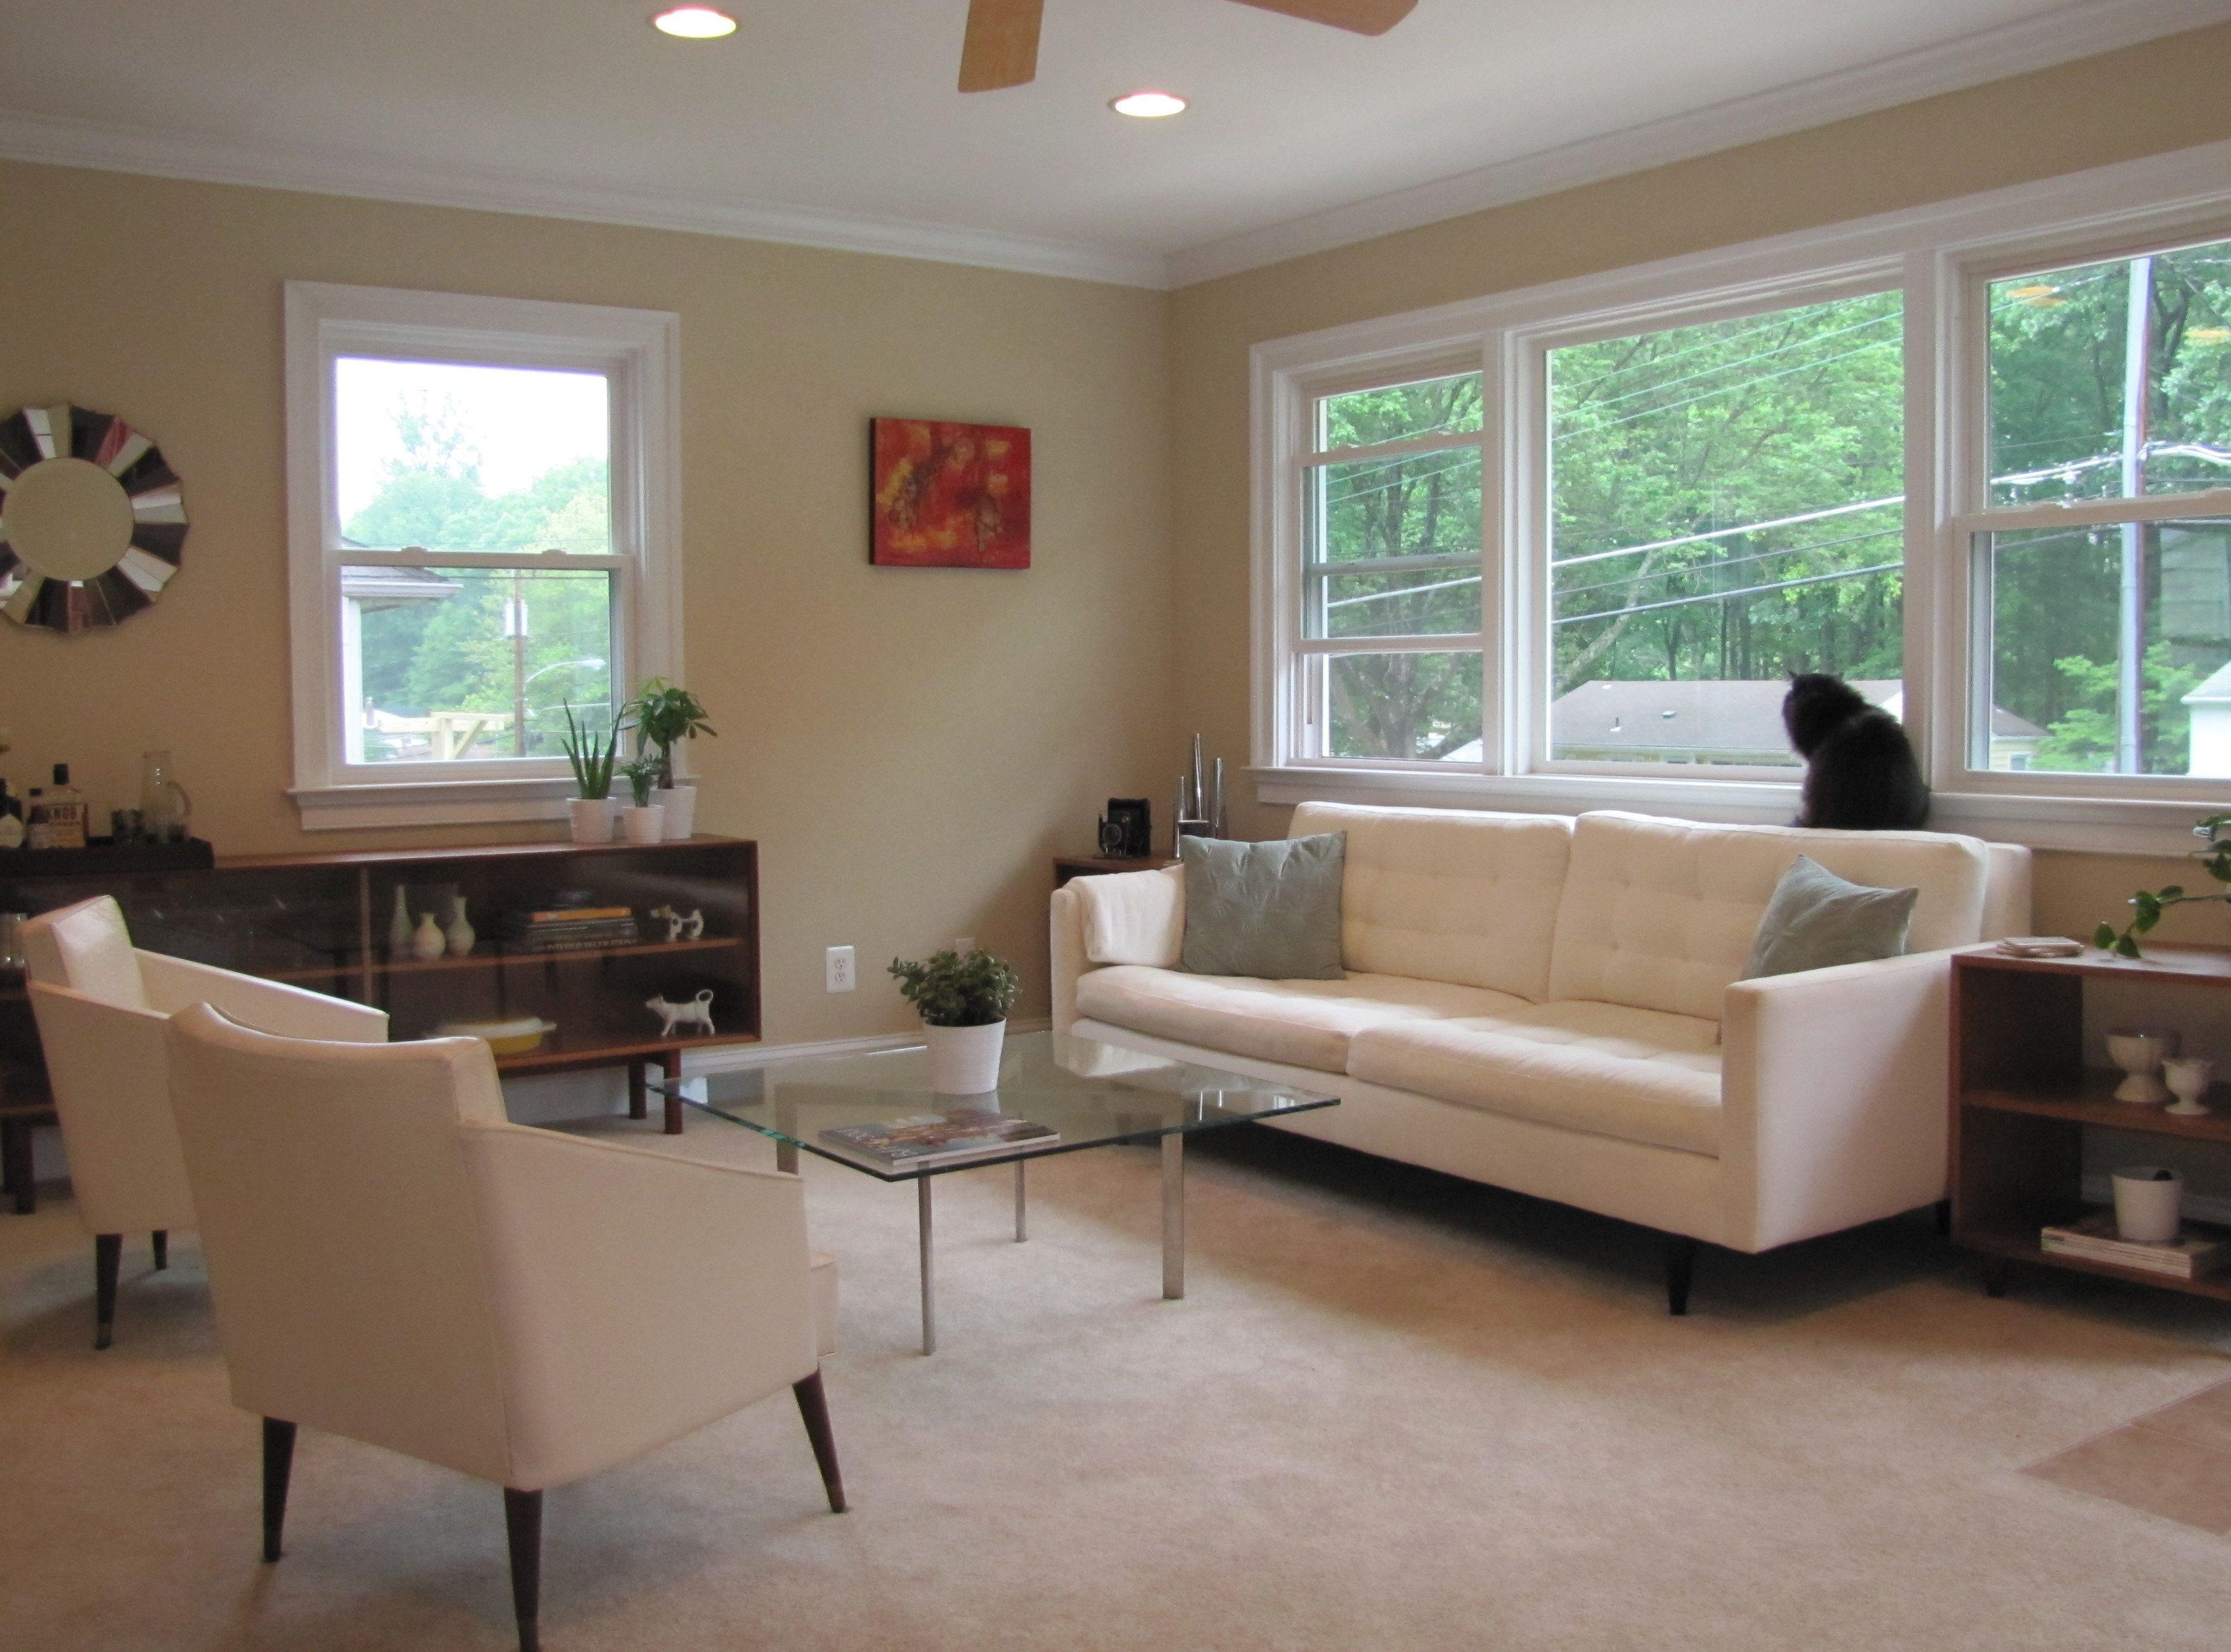 living room sets on craigslist living room ideas in 2018 living rh pinterest com